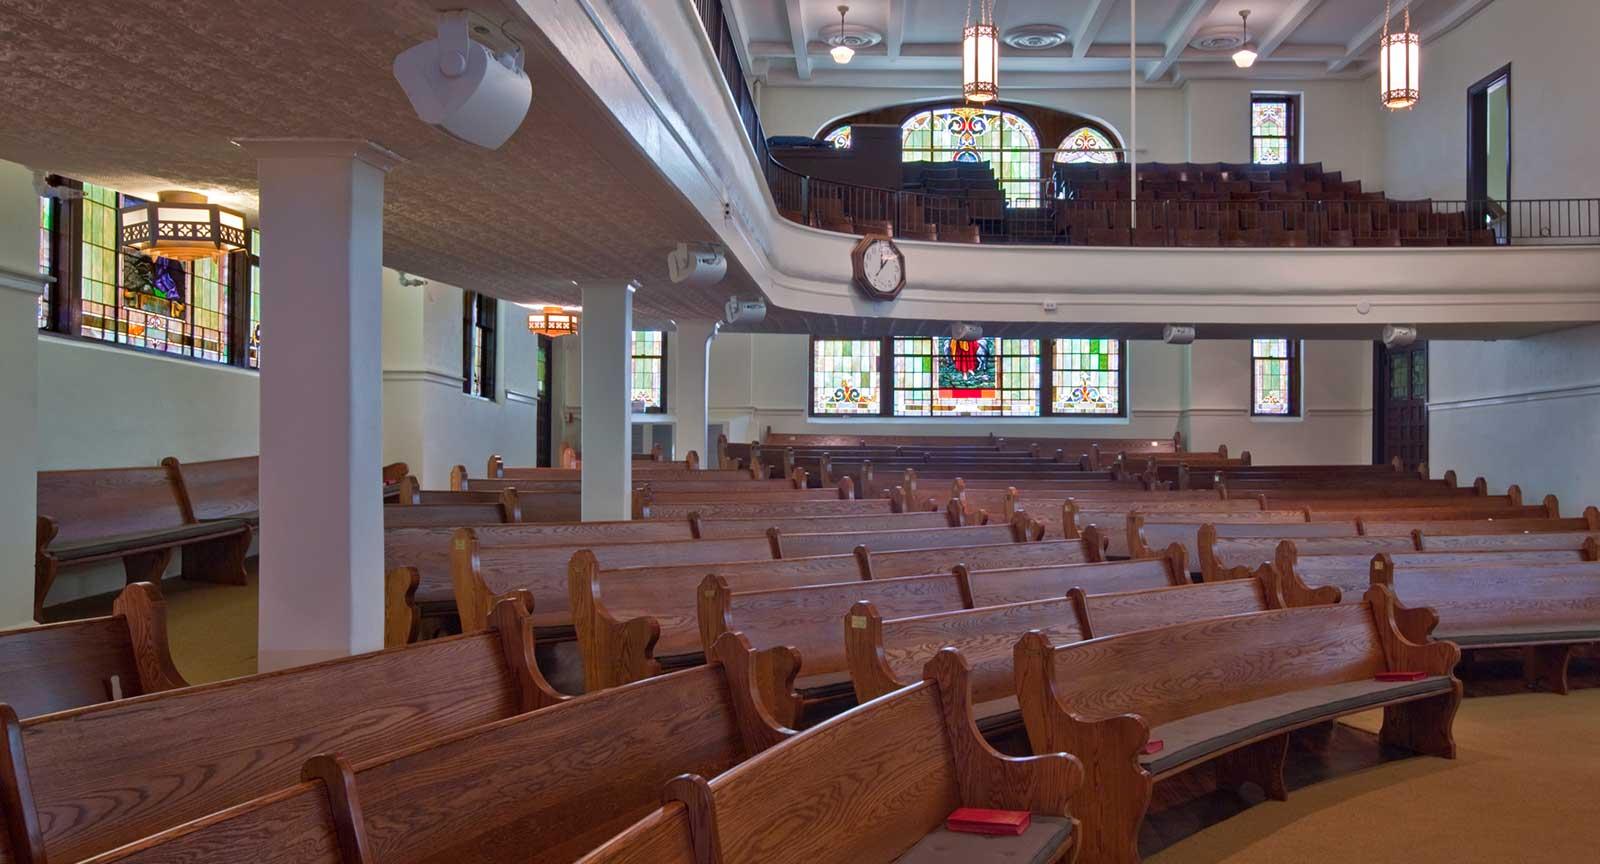 Dallas Arts District St. Paul United Methodist Interior Pews